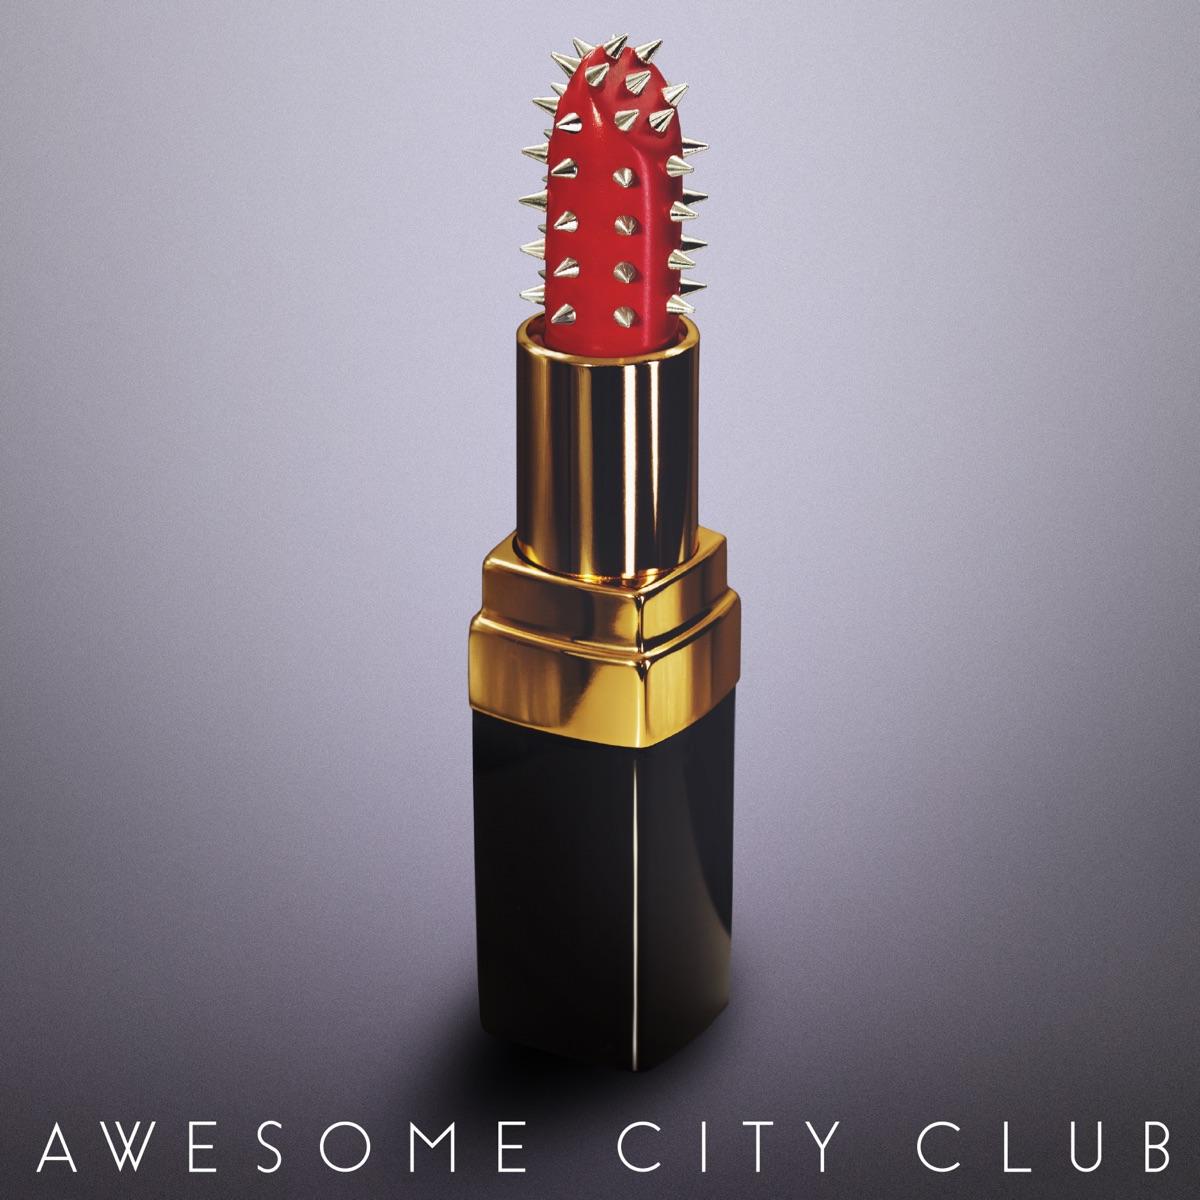 『Awesome City Club - アンビバレンス 歌詞』収録の『アンビバレンス』ジャケット